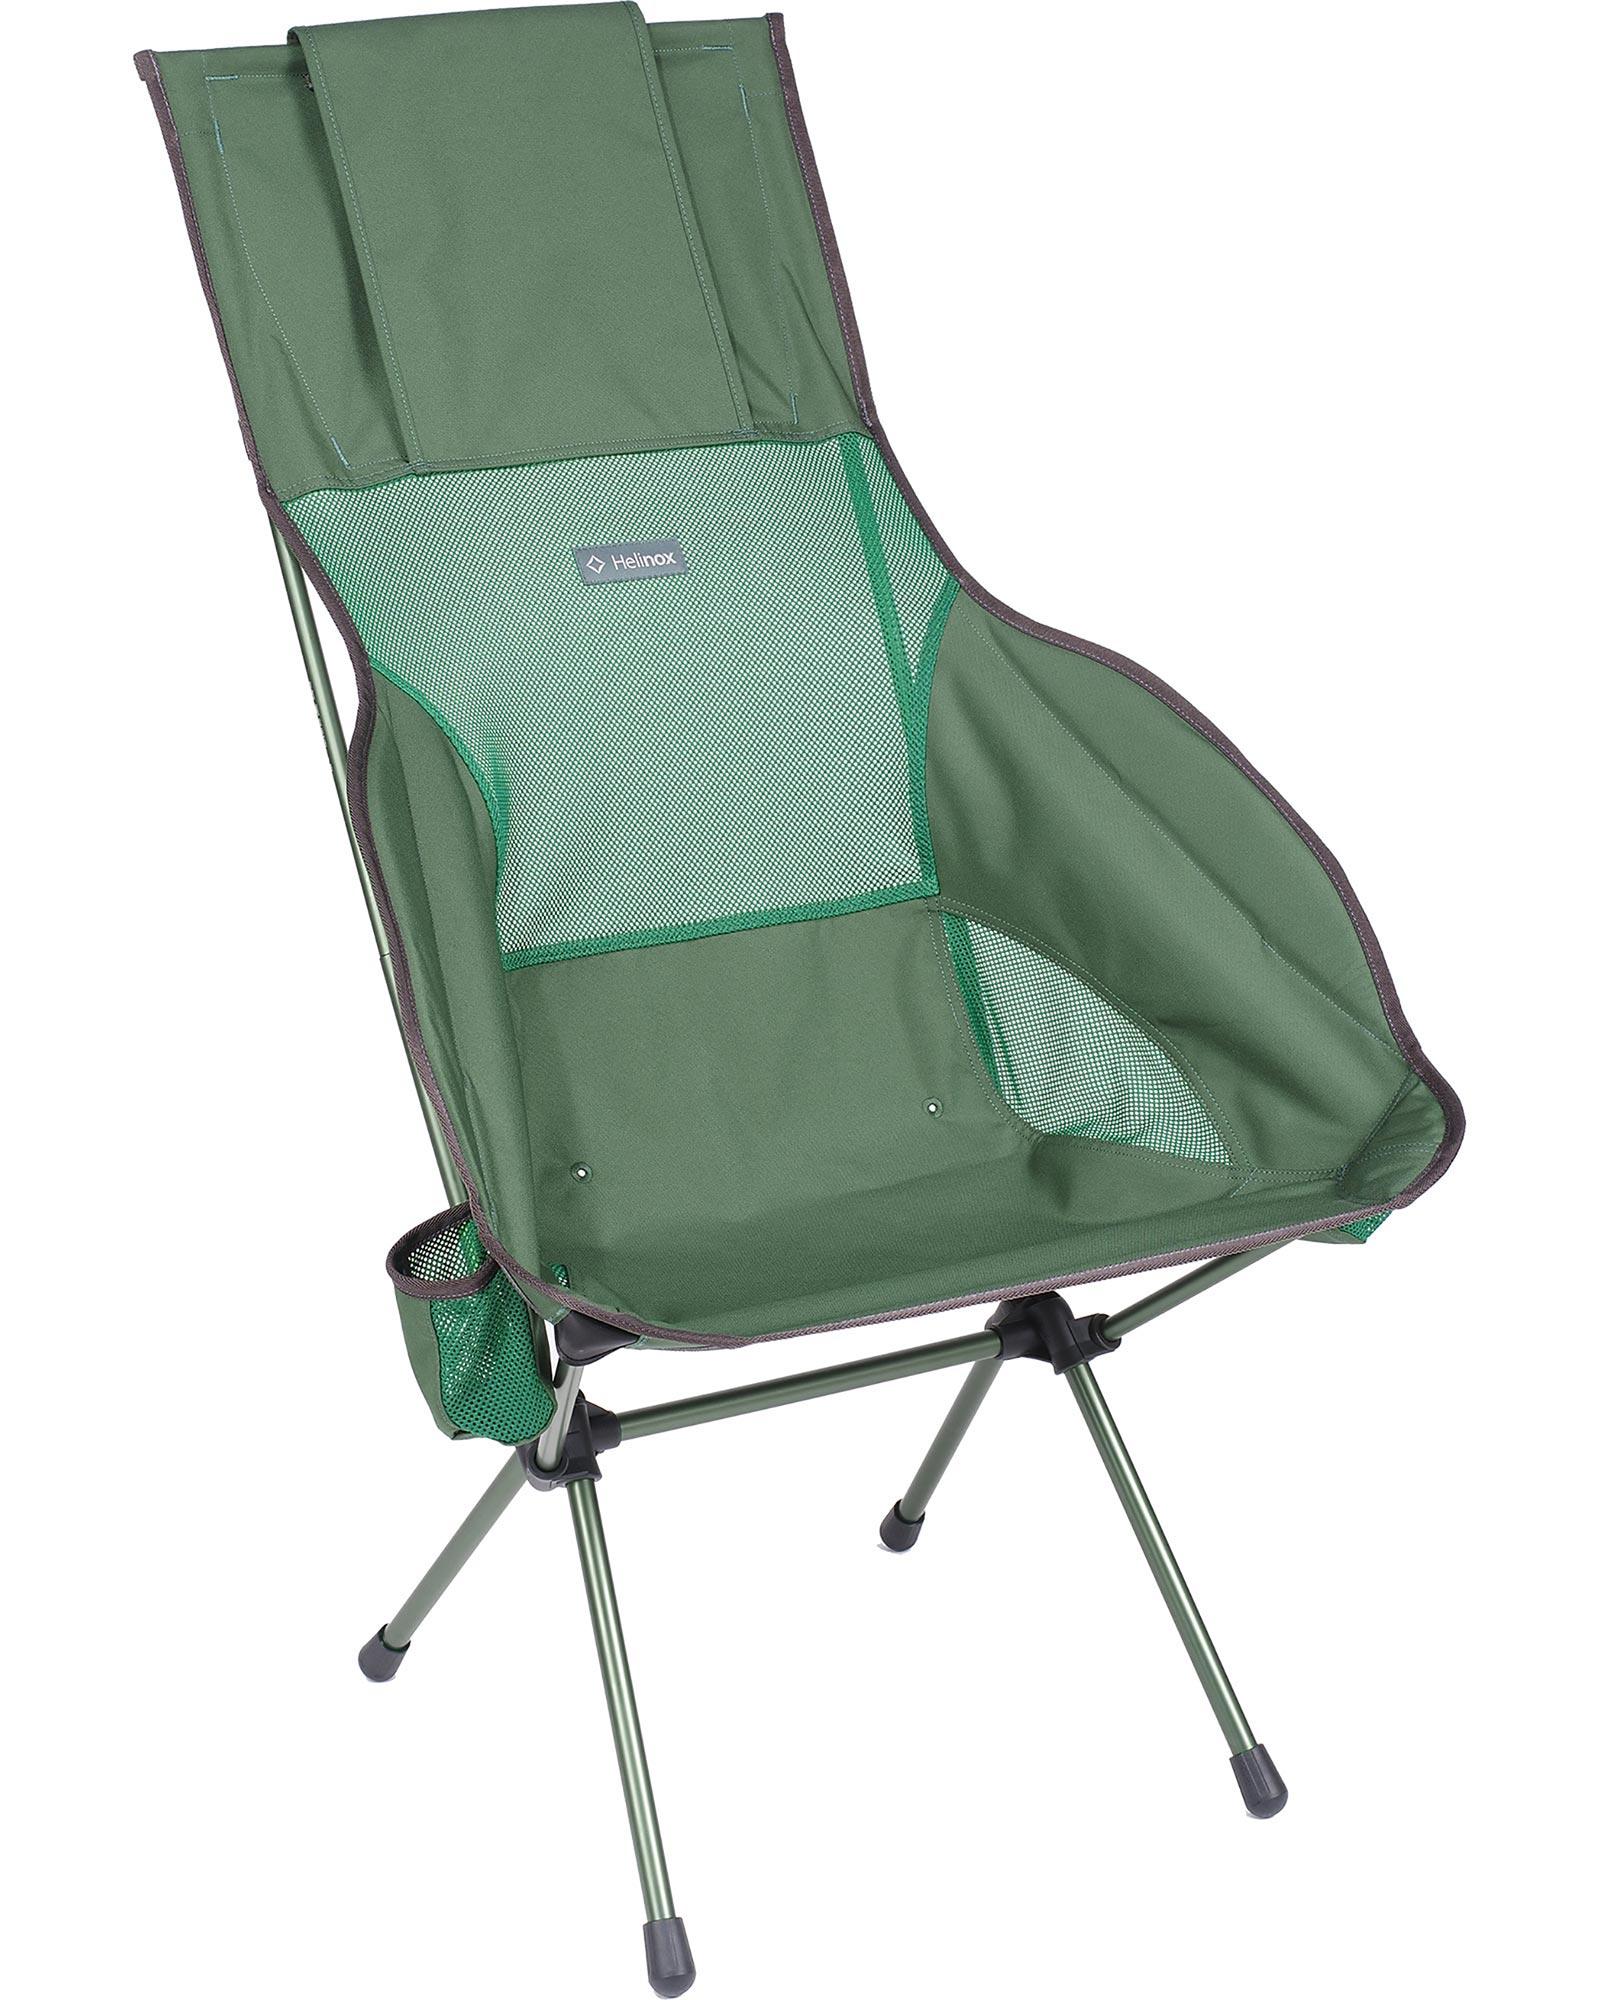 Product image of Helinox Savanna Chair